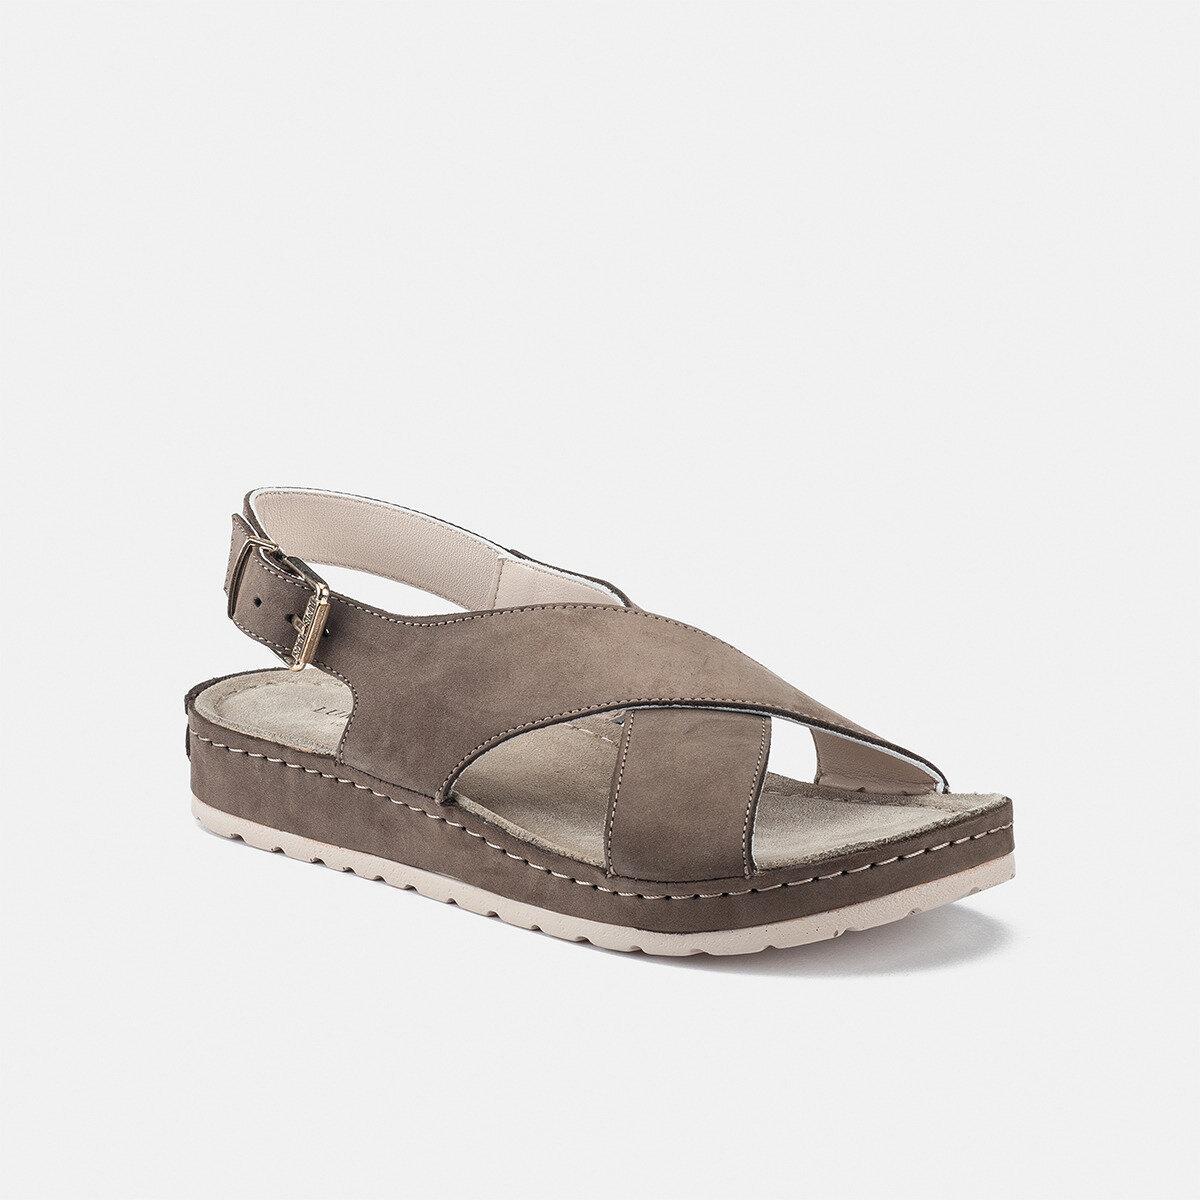 EZA Taupe Woman Sandals